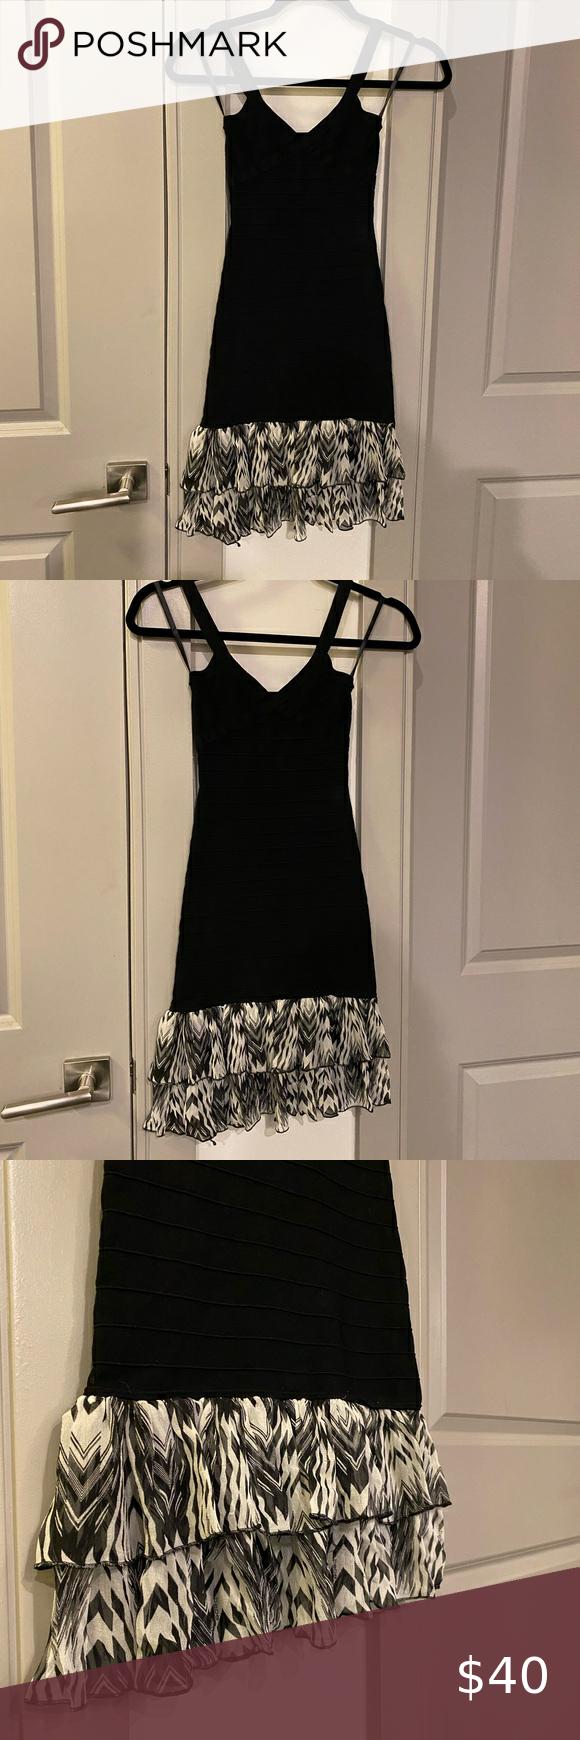 Bebe Bodycon Dress With Ruffle Base Bodycon Dress Dresses Black Bodycon Dress [ 1740 x 580 Pixel ]